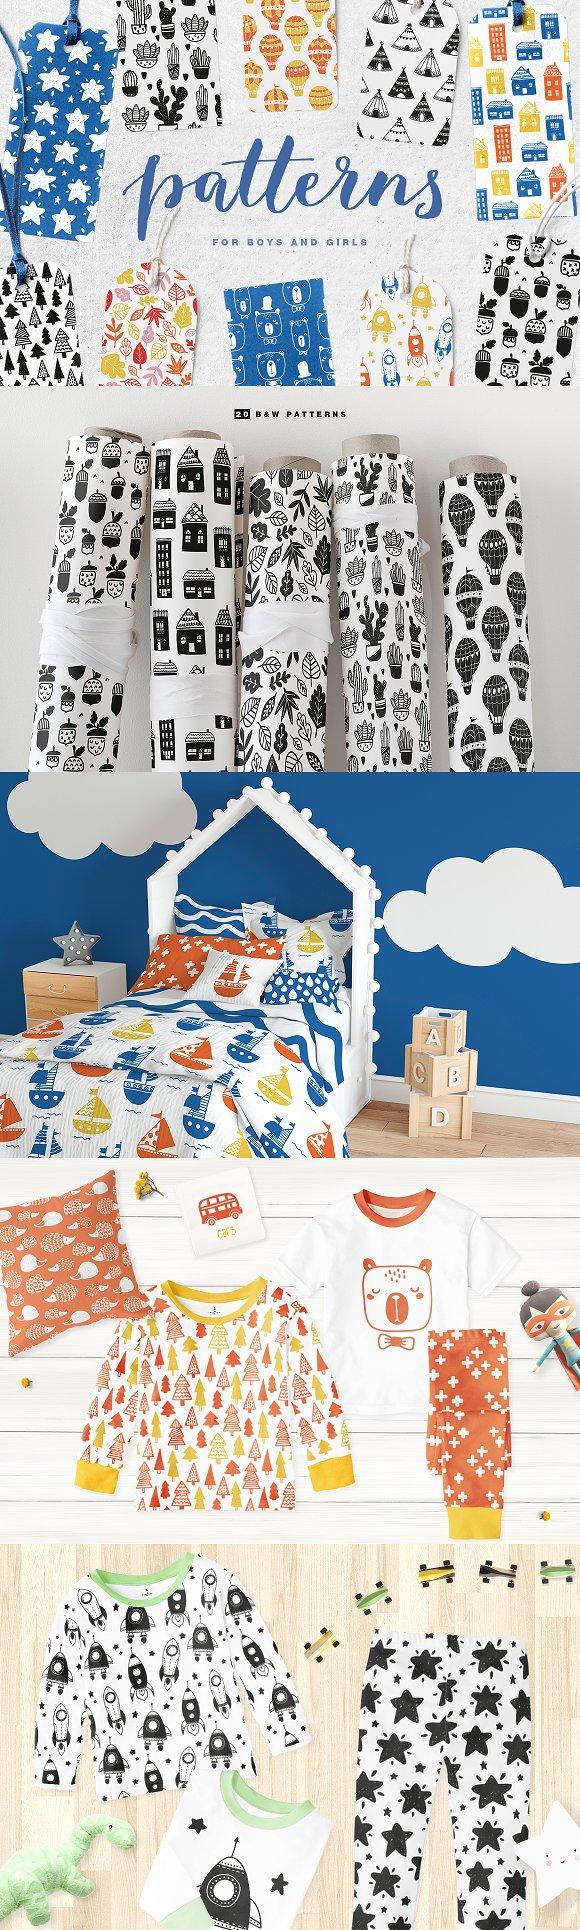 51 kids patterns, for boys & girls! in Patterns